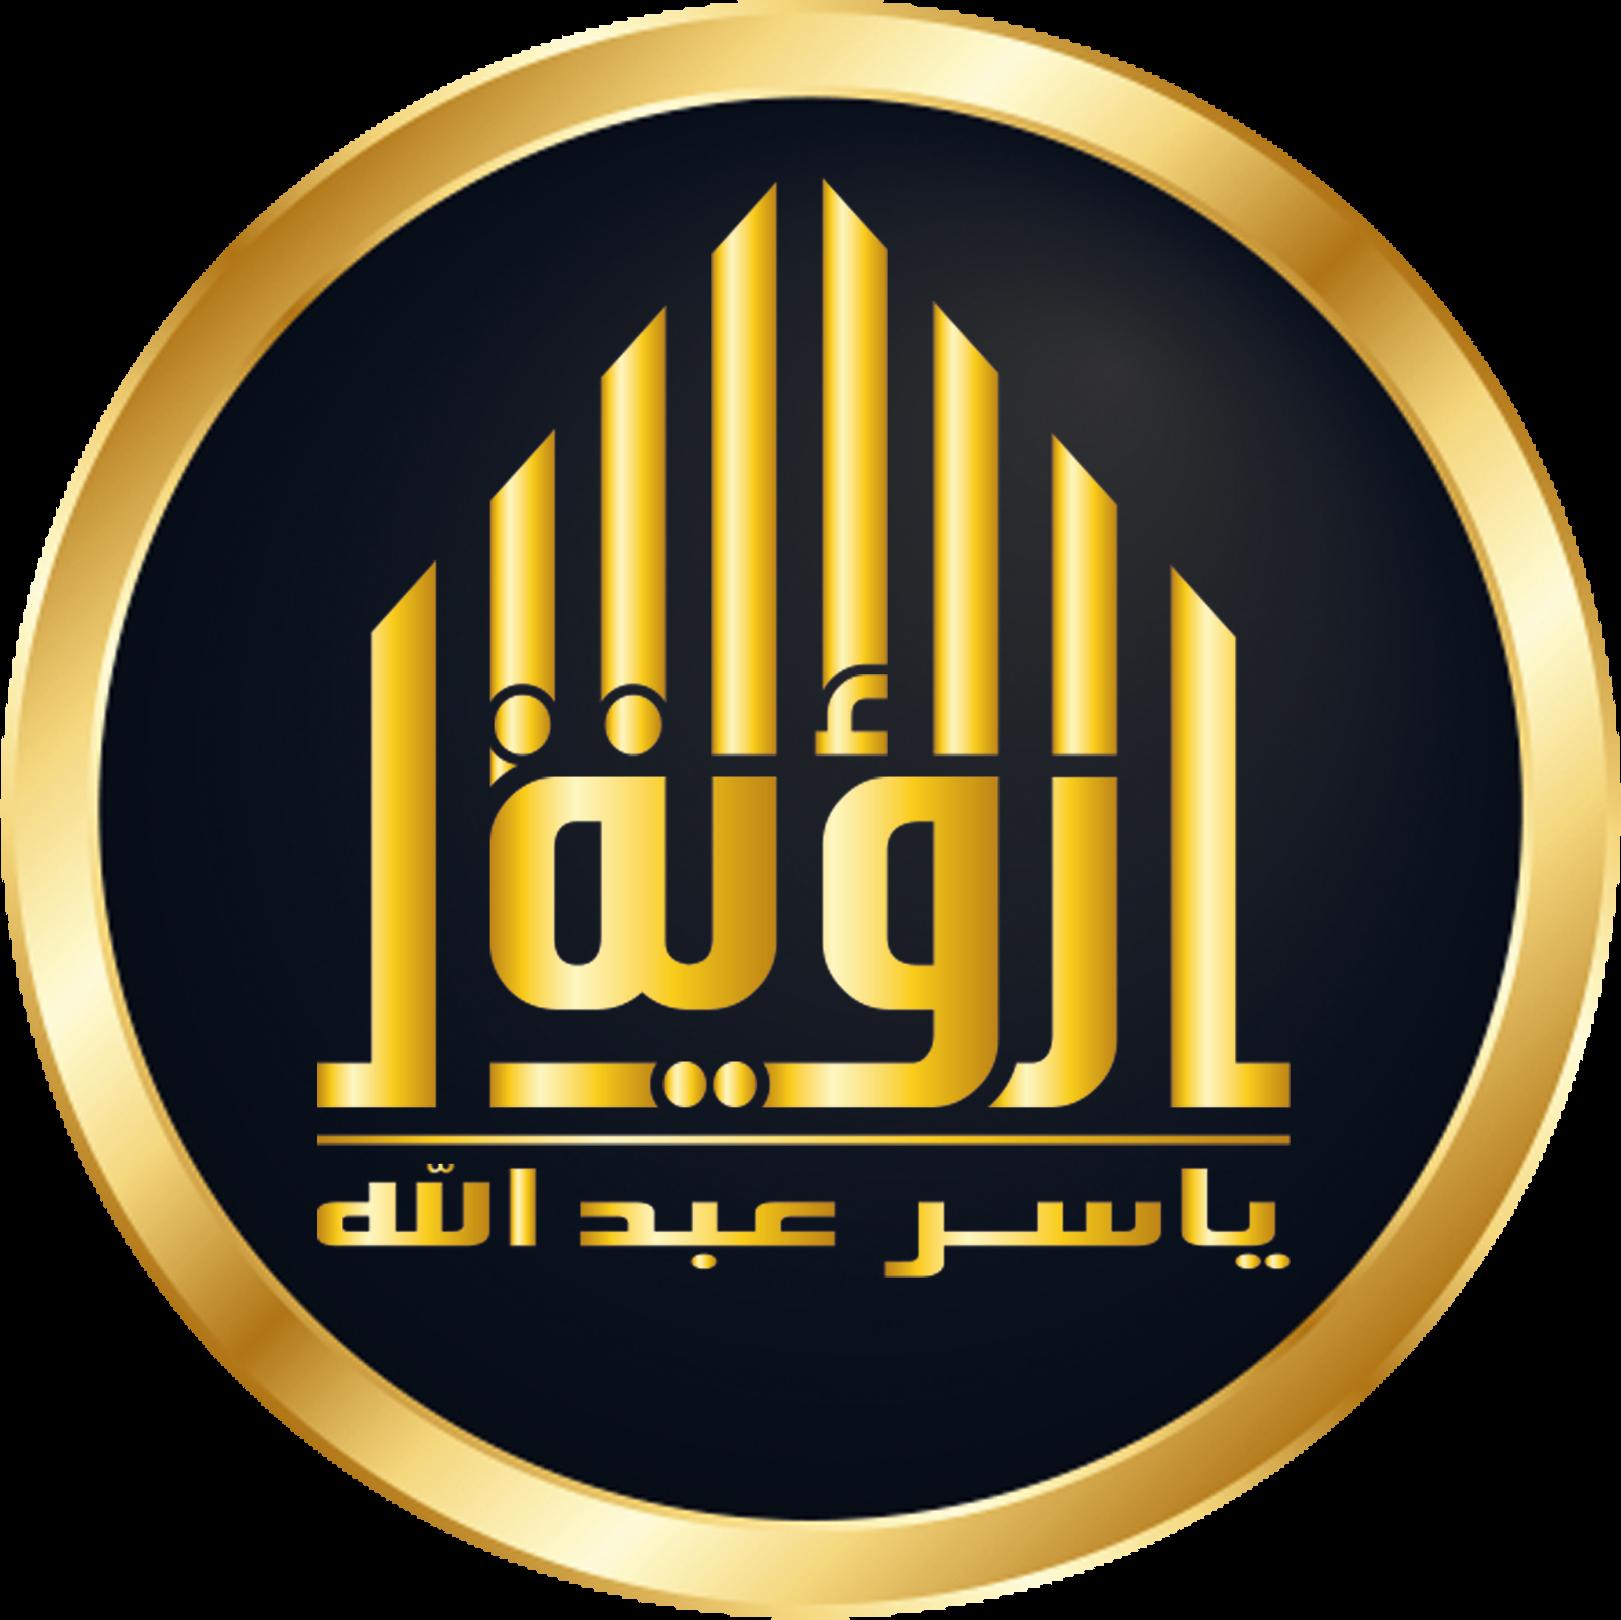 Roaya Eng Yasser Abdallah